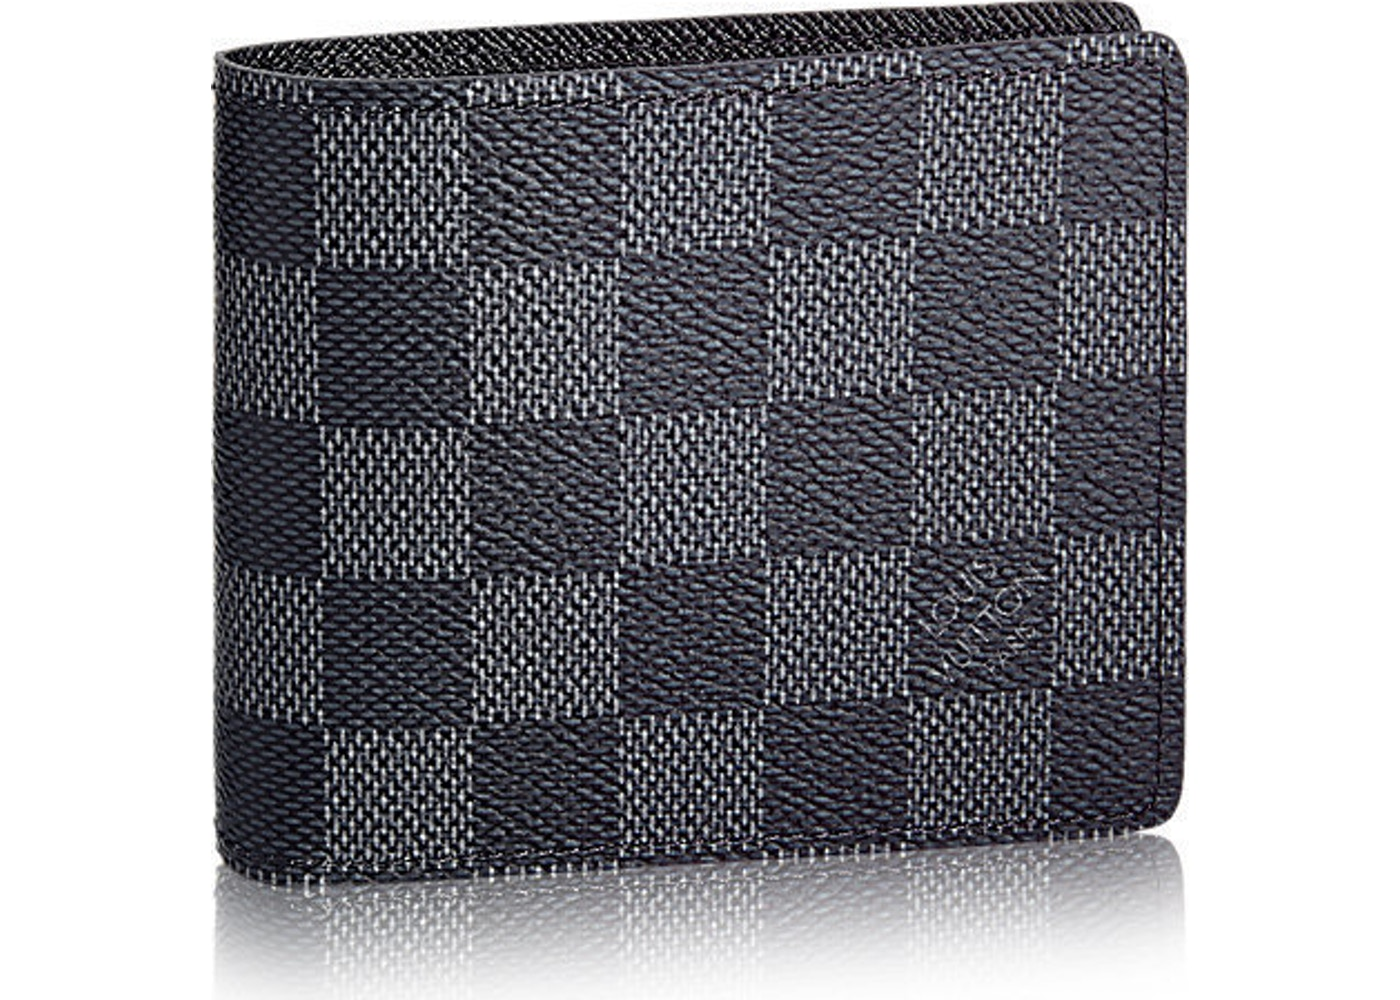 5247cb6a8d04 Louis Vuitton Wallet Slender Damier Graphite Gray Black. Damier Graphite  Gray Black